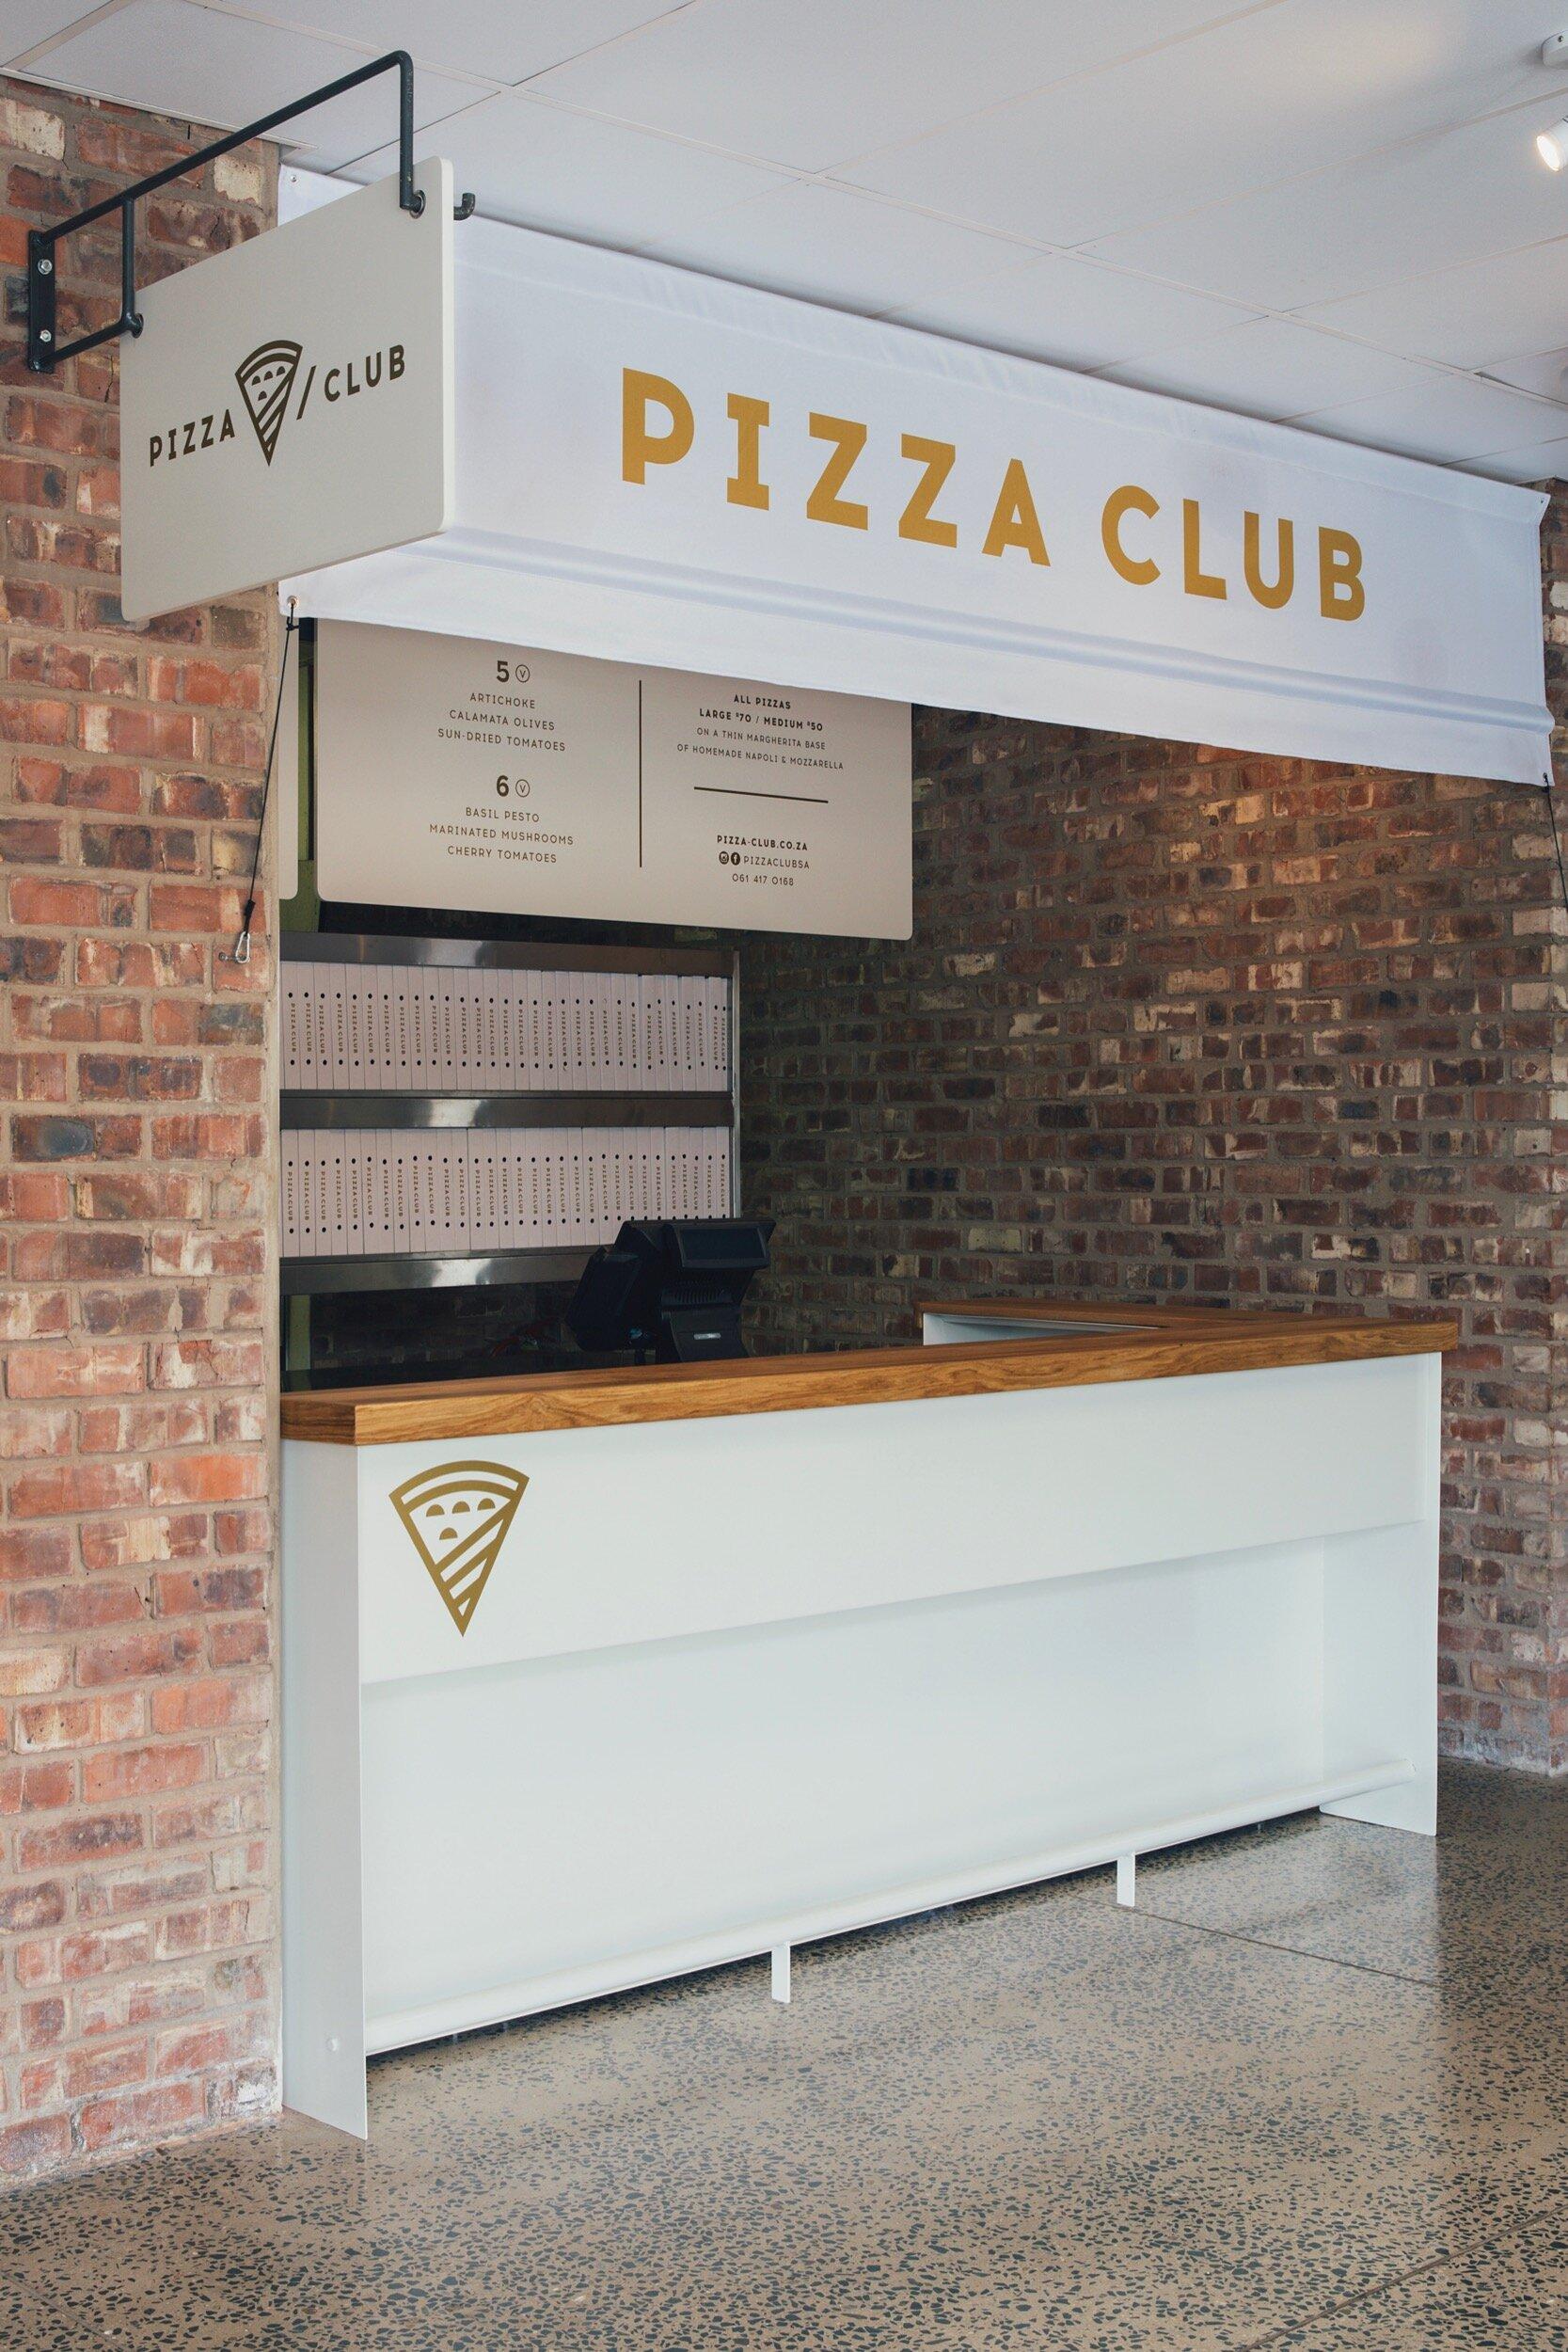 pizzaclub-527.jpg